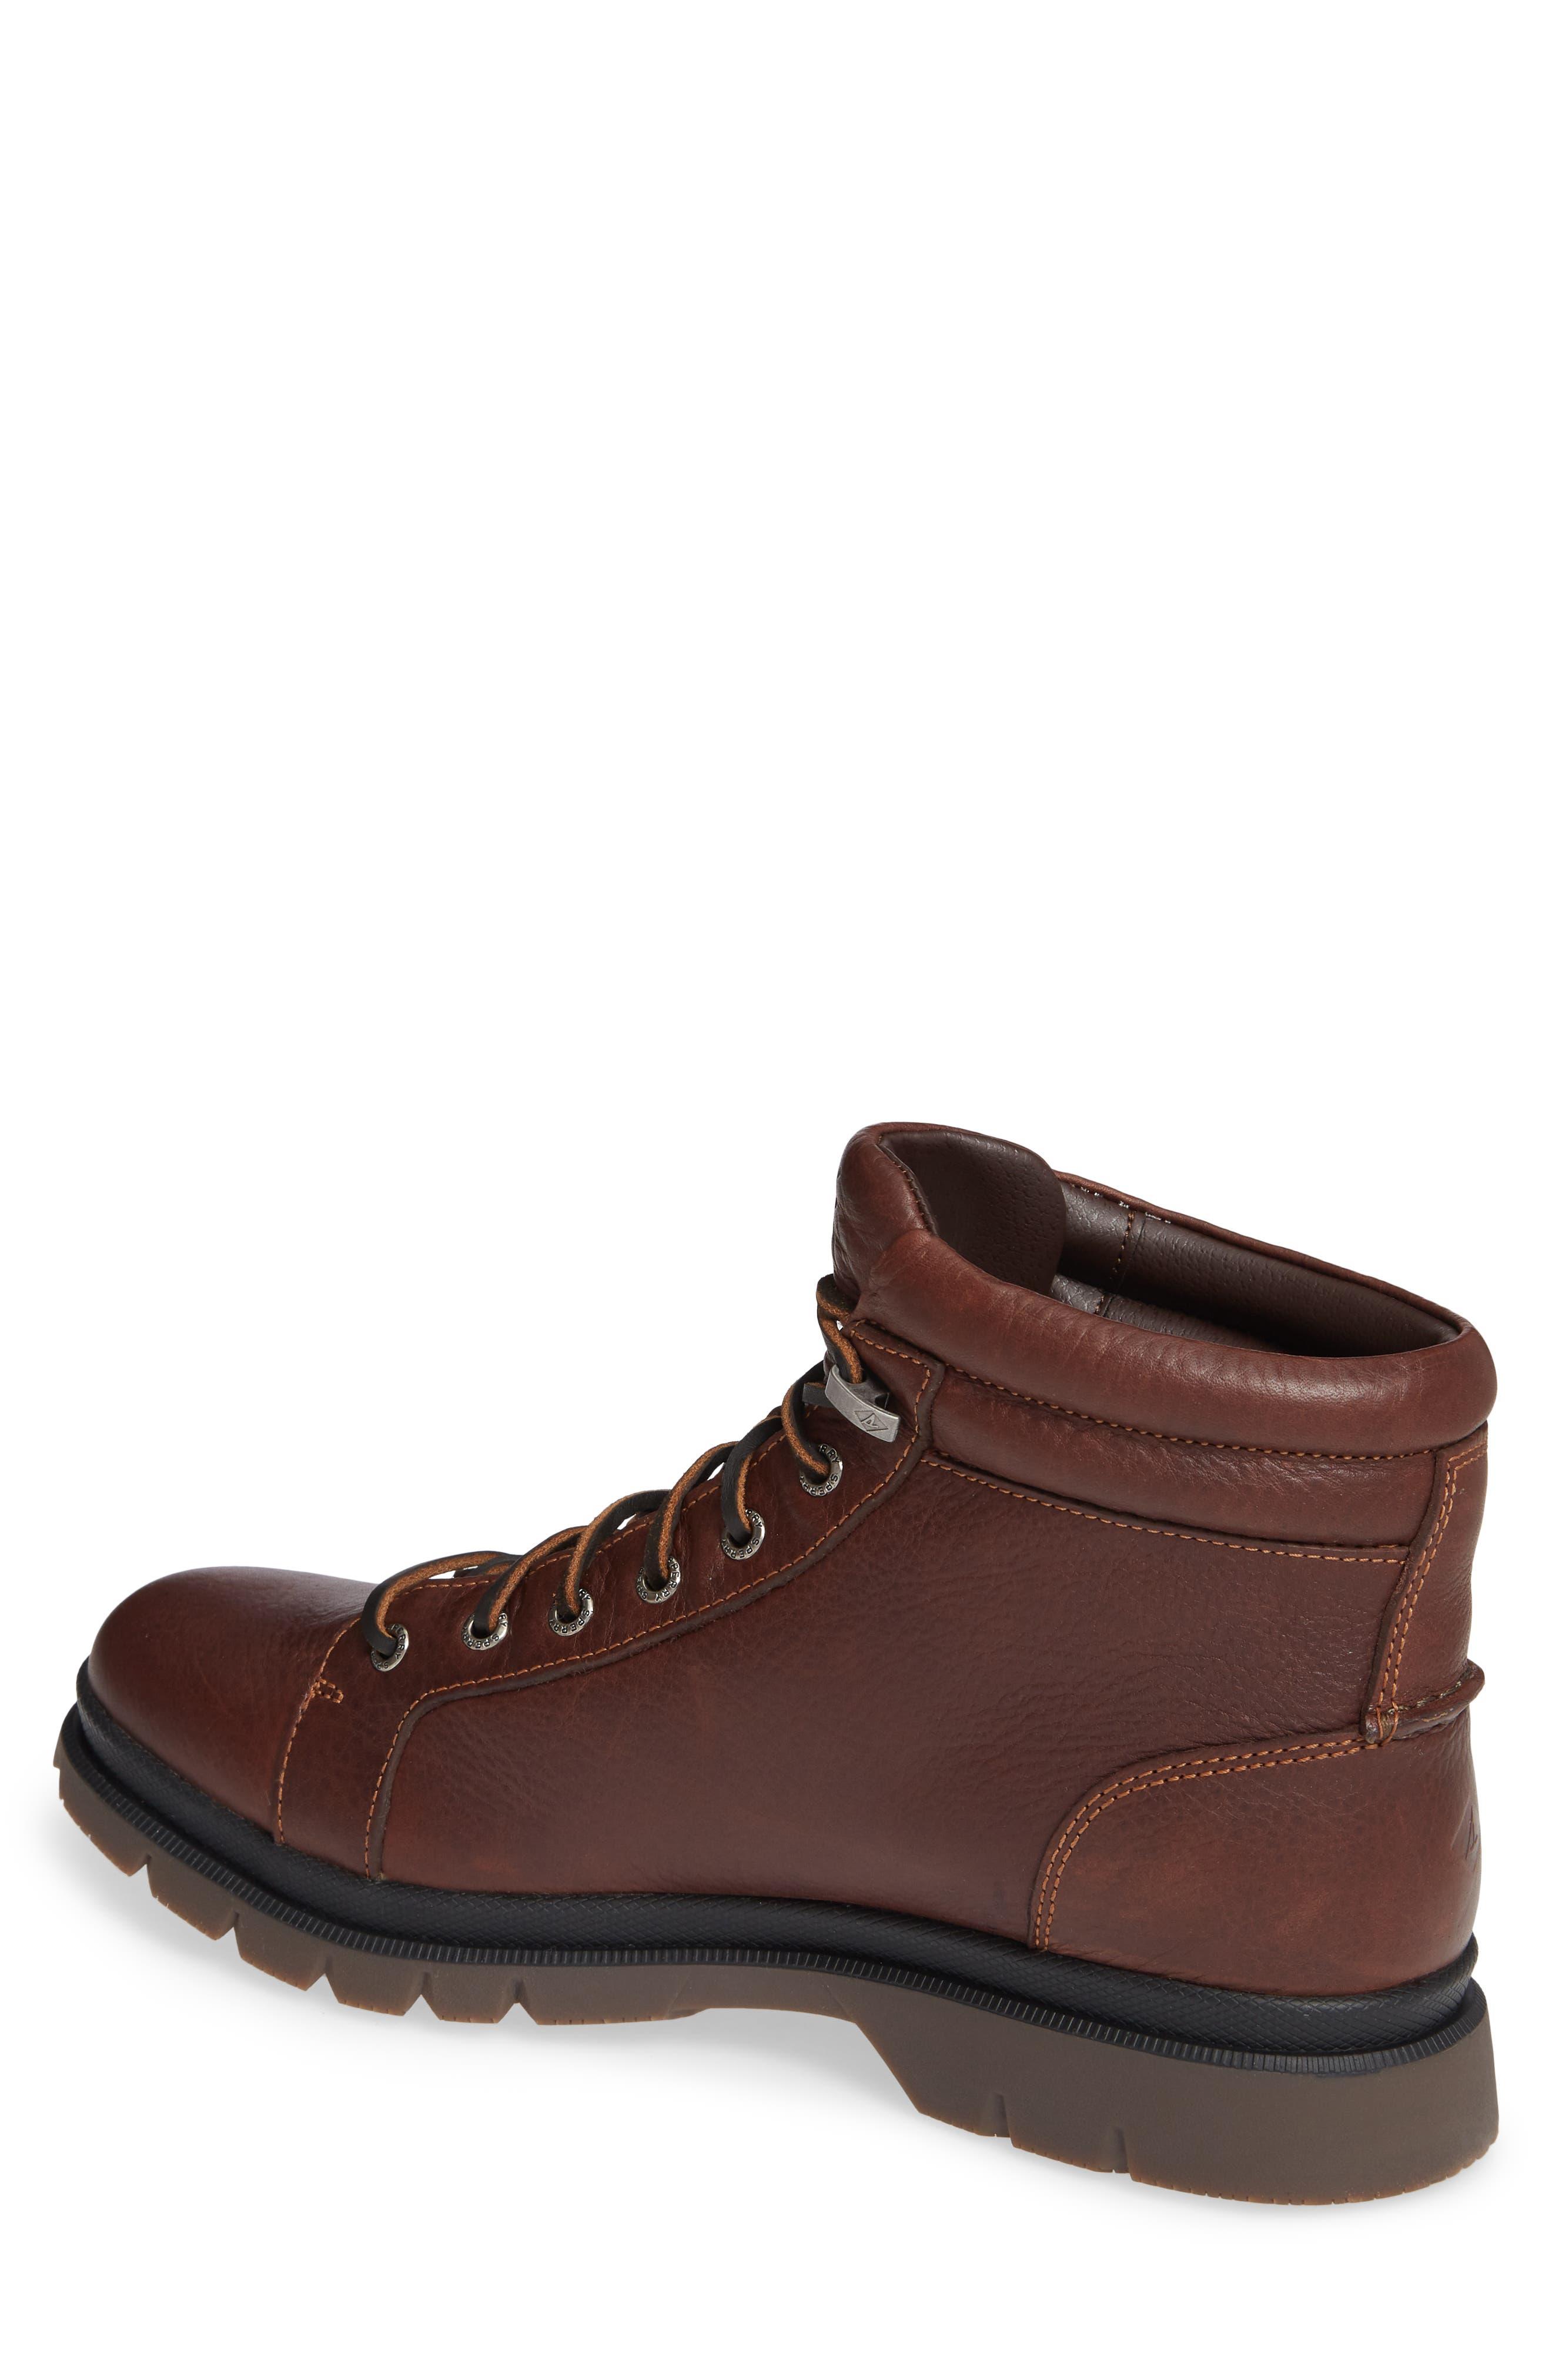 SPERRY, Watertown Waterproof Plain Toe Boot, Alternate thumbnail 2, color, DARK BROWN